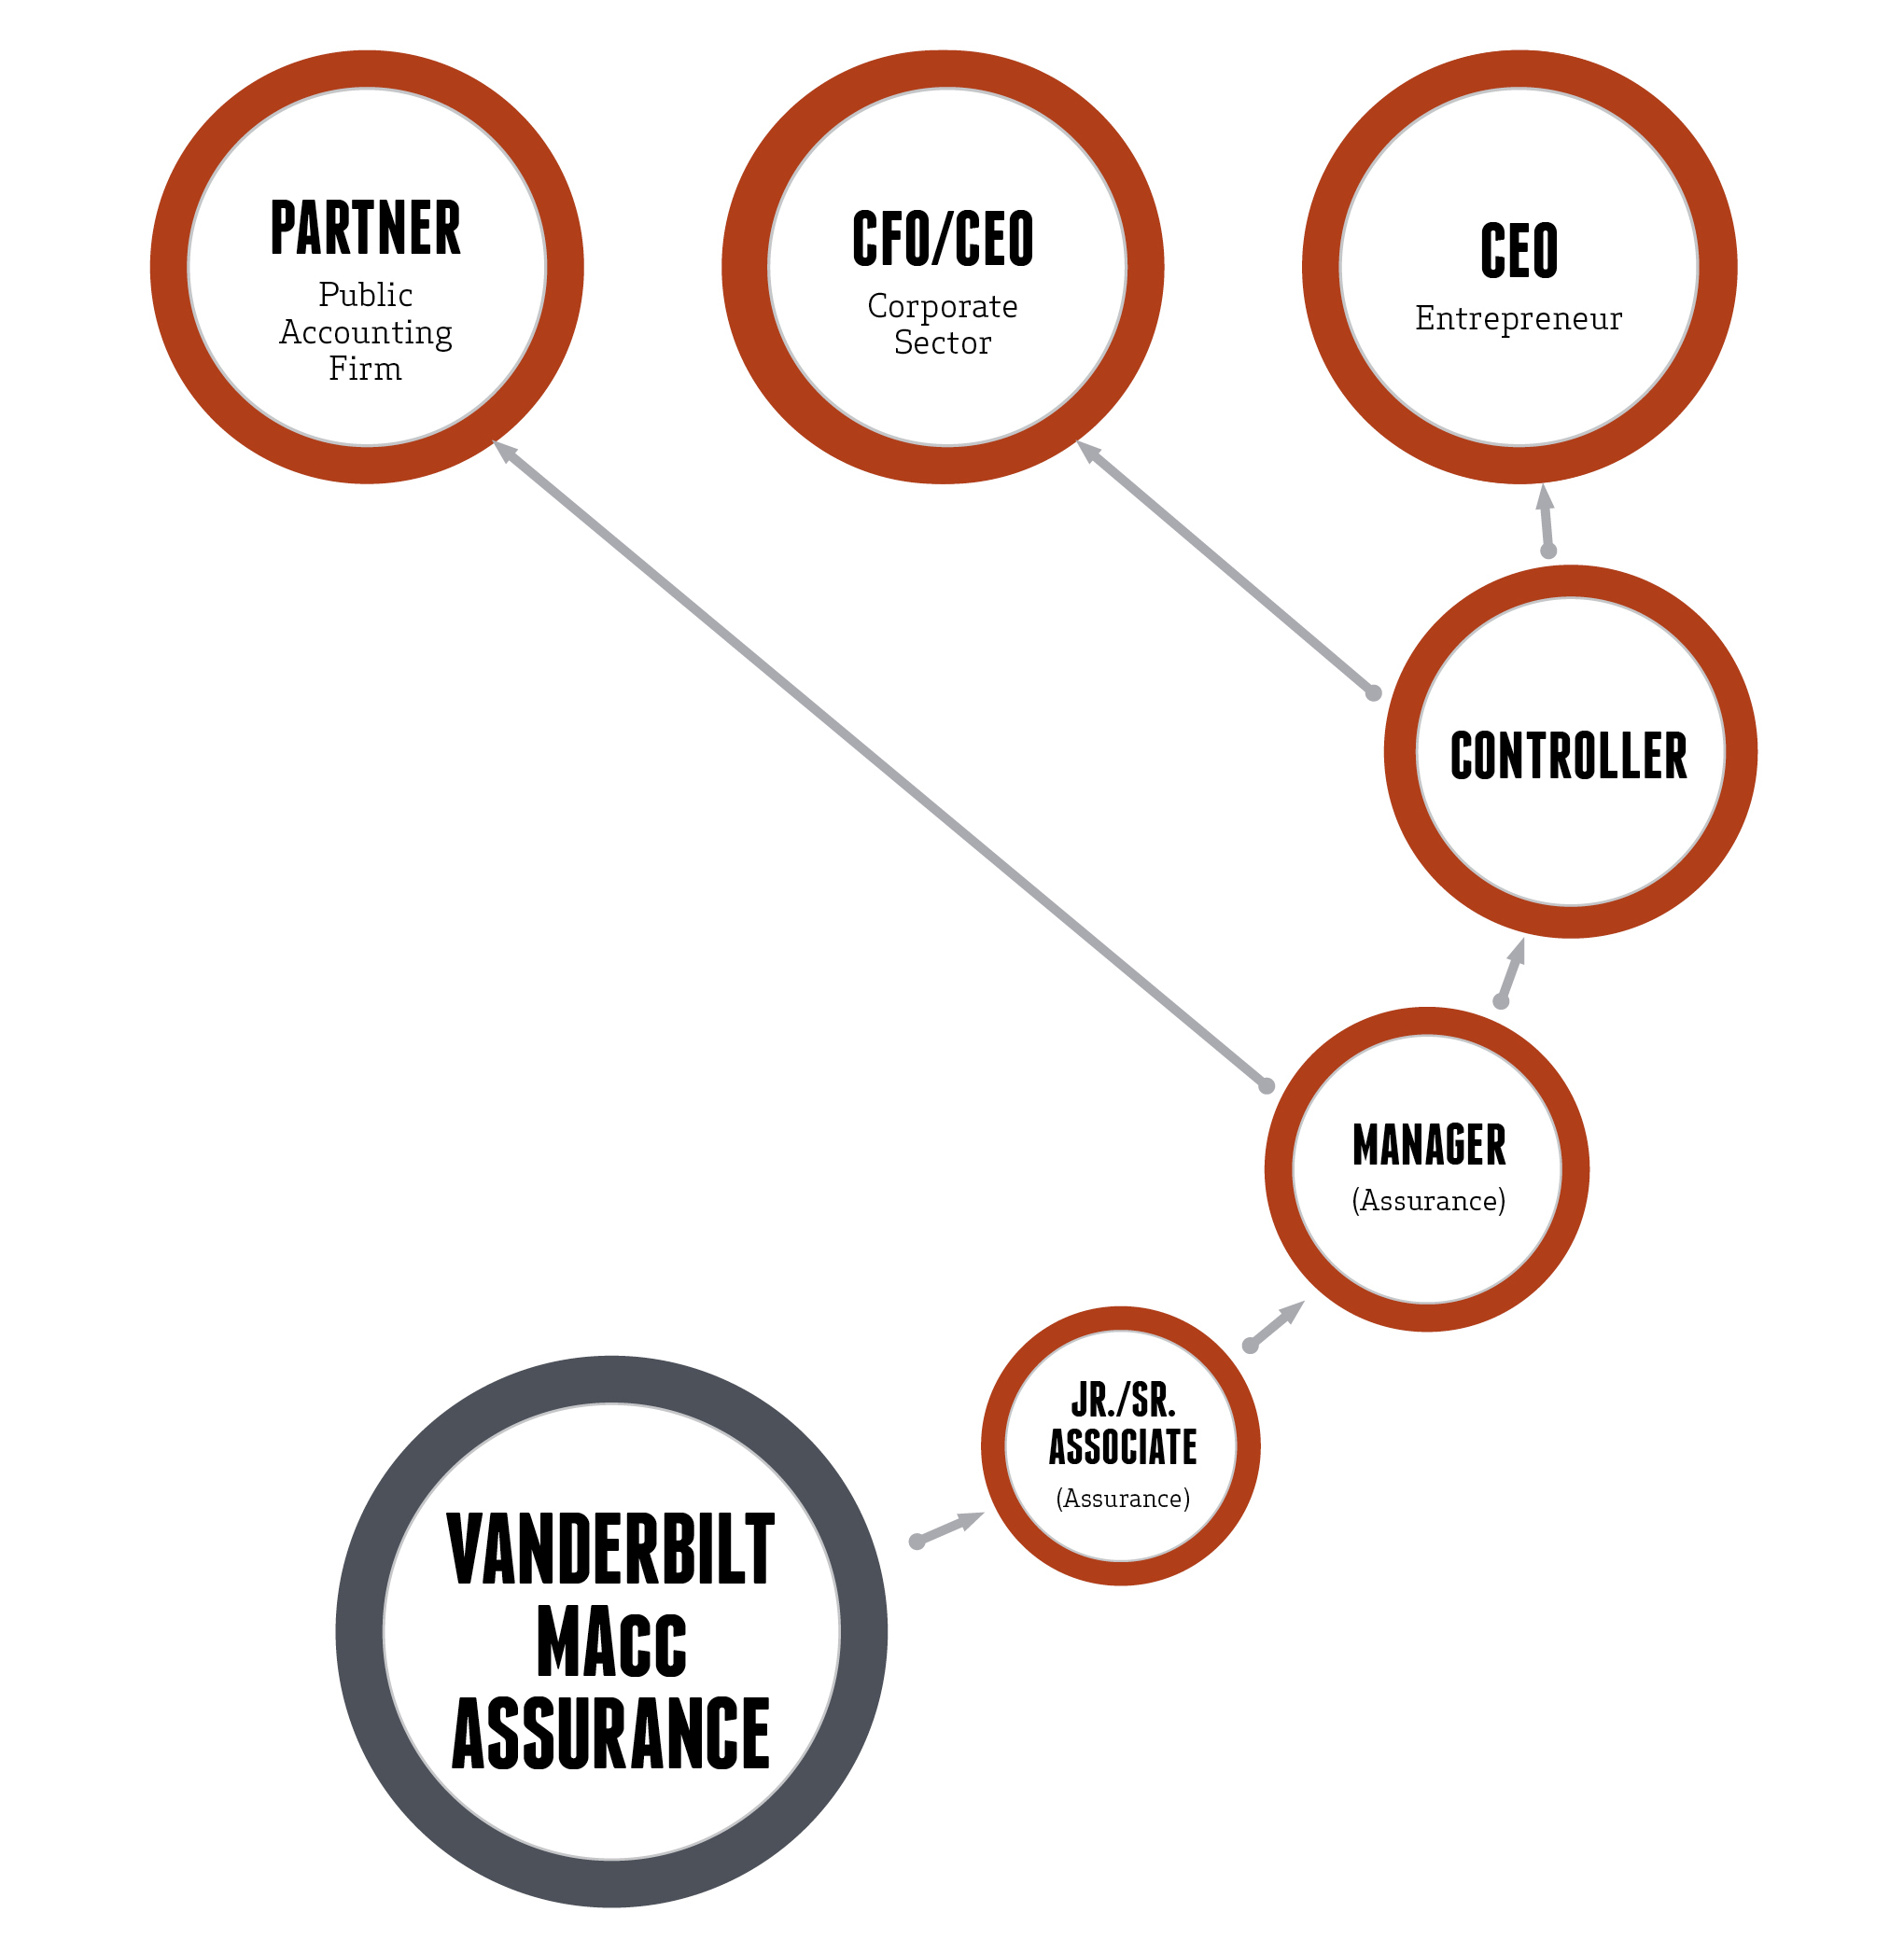 MAcc Assurance Career Paths Graphic